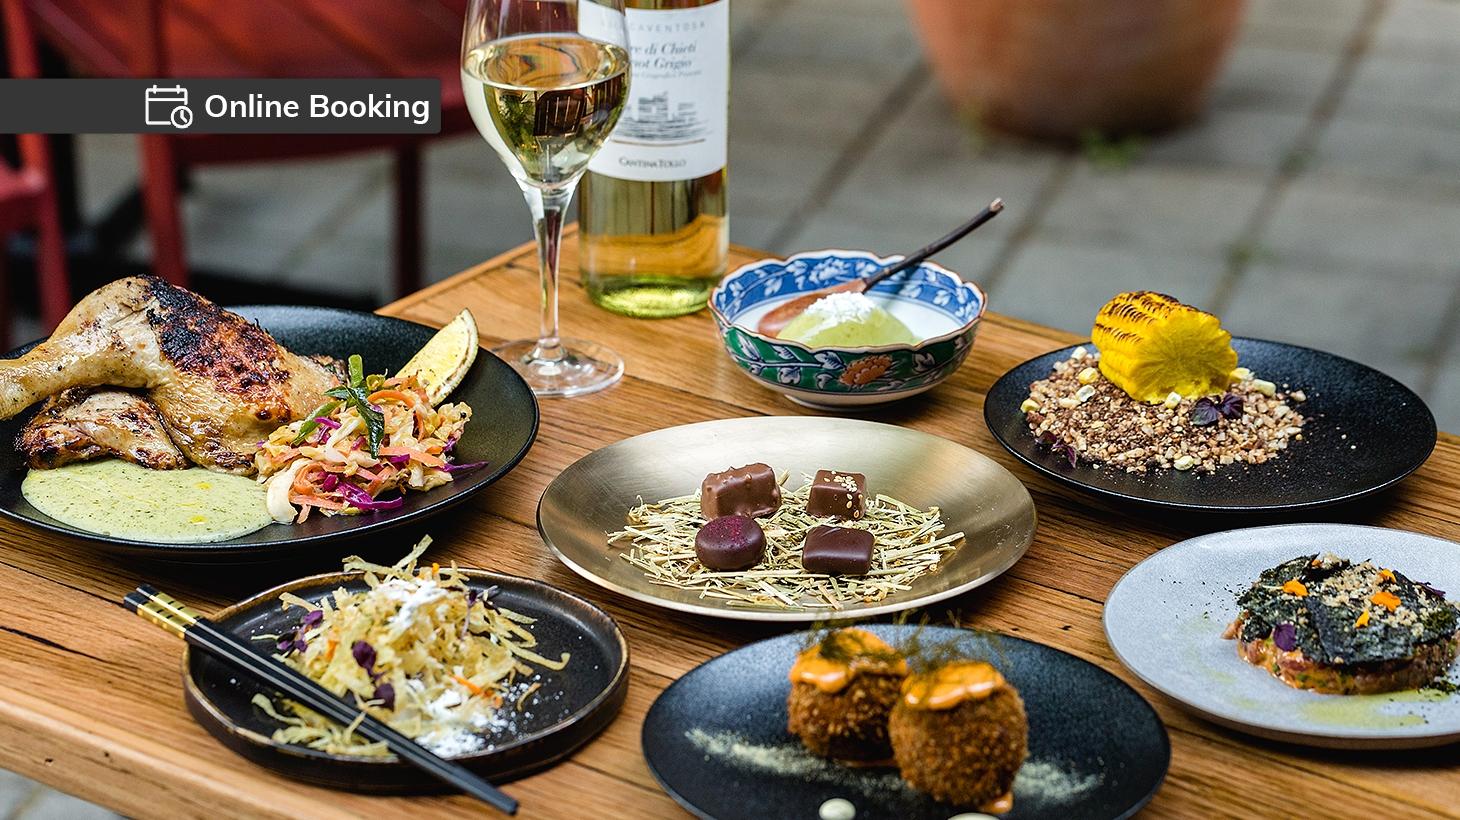 Binchotan Grill & Tapas 7 course degustation